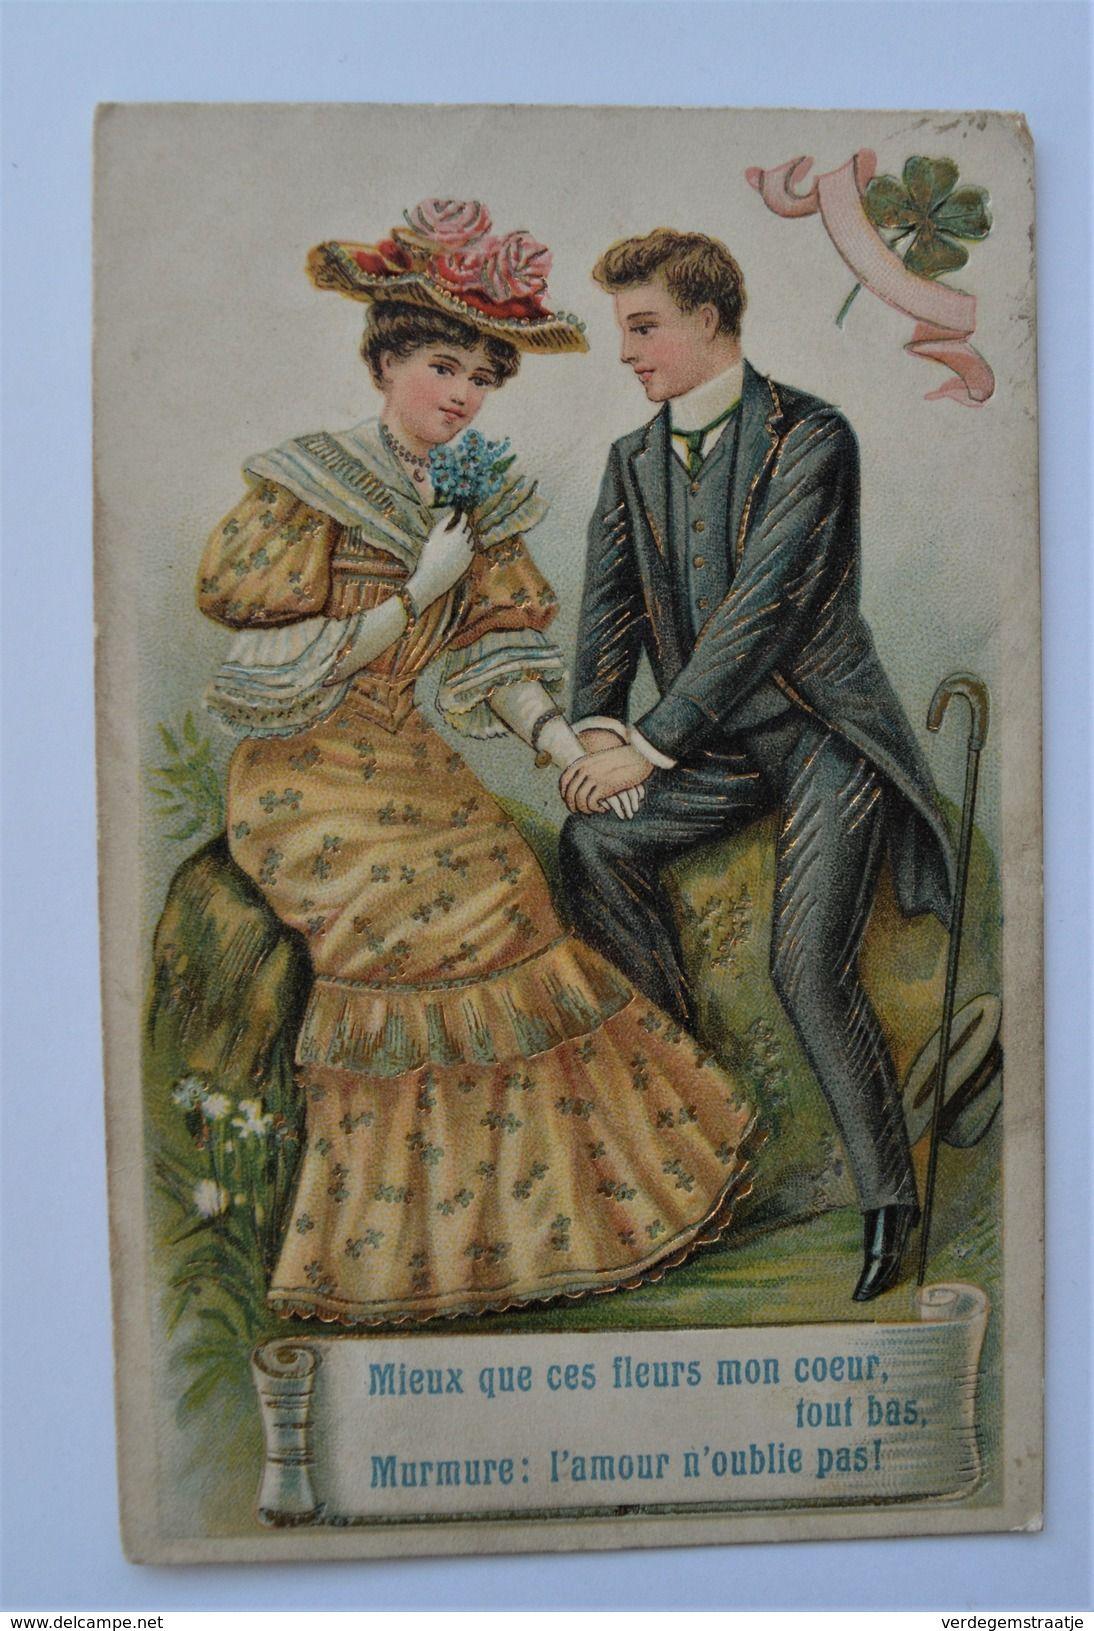 PK/CP Couple Valentine Valentijn Dore Dorure Gold Embossed Gaufree Mode Relief Edit. ASB Litho 1910 SECRET MESSAGE LOOK!